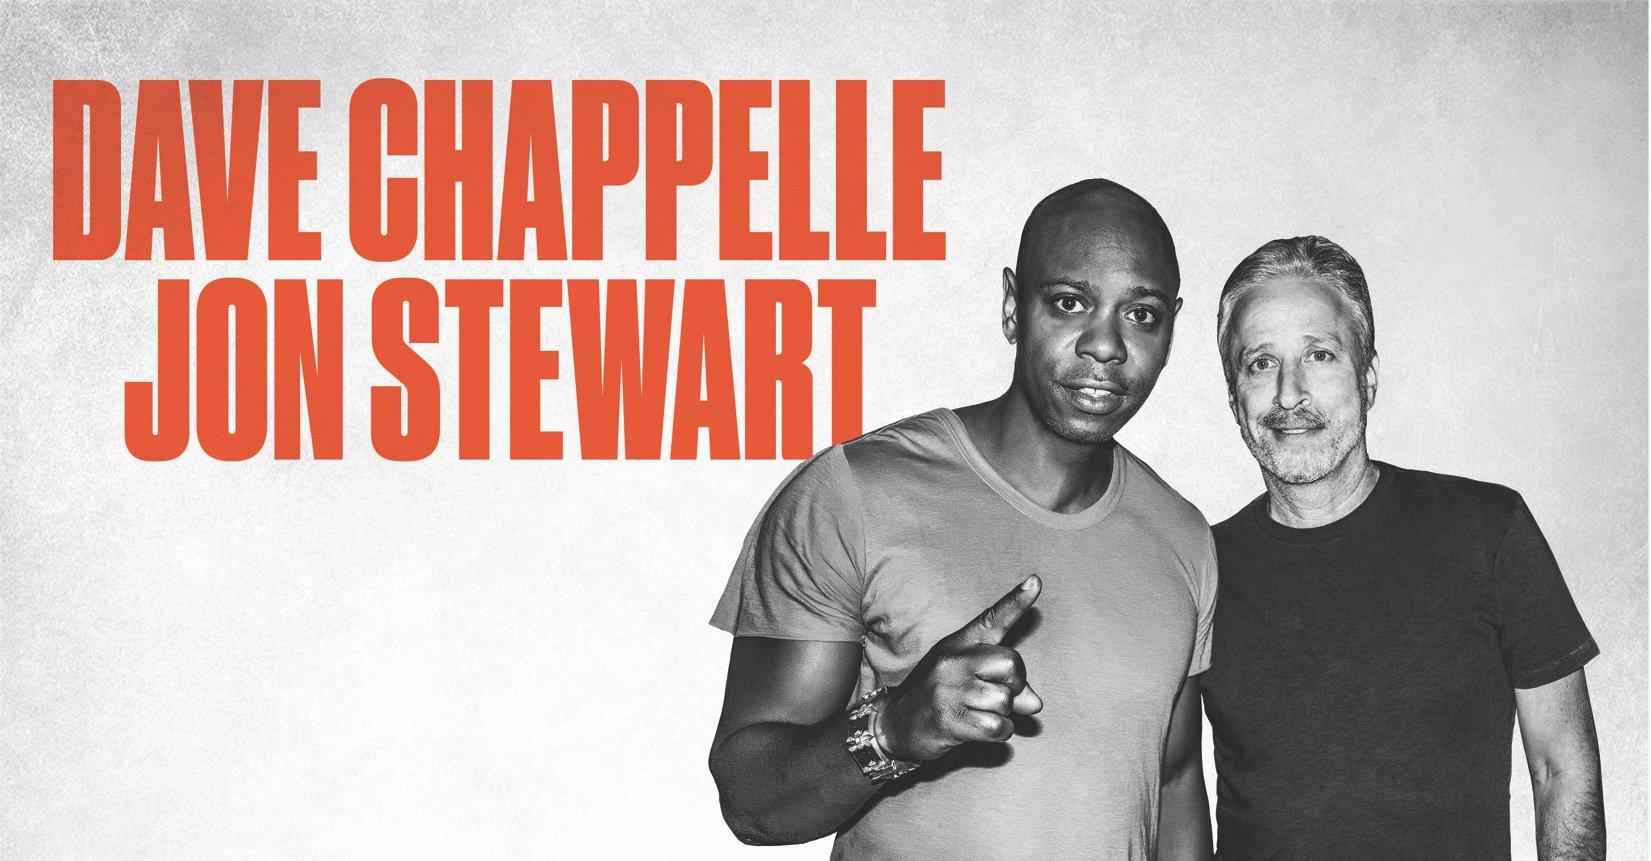 Dave Chappelle and Jon Stewart announce stand-up tour https://t.co/kgvGskku2Q https://t.co/vjZMvYvsr7